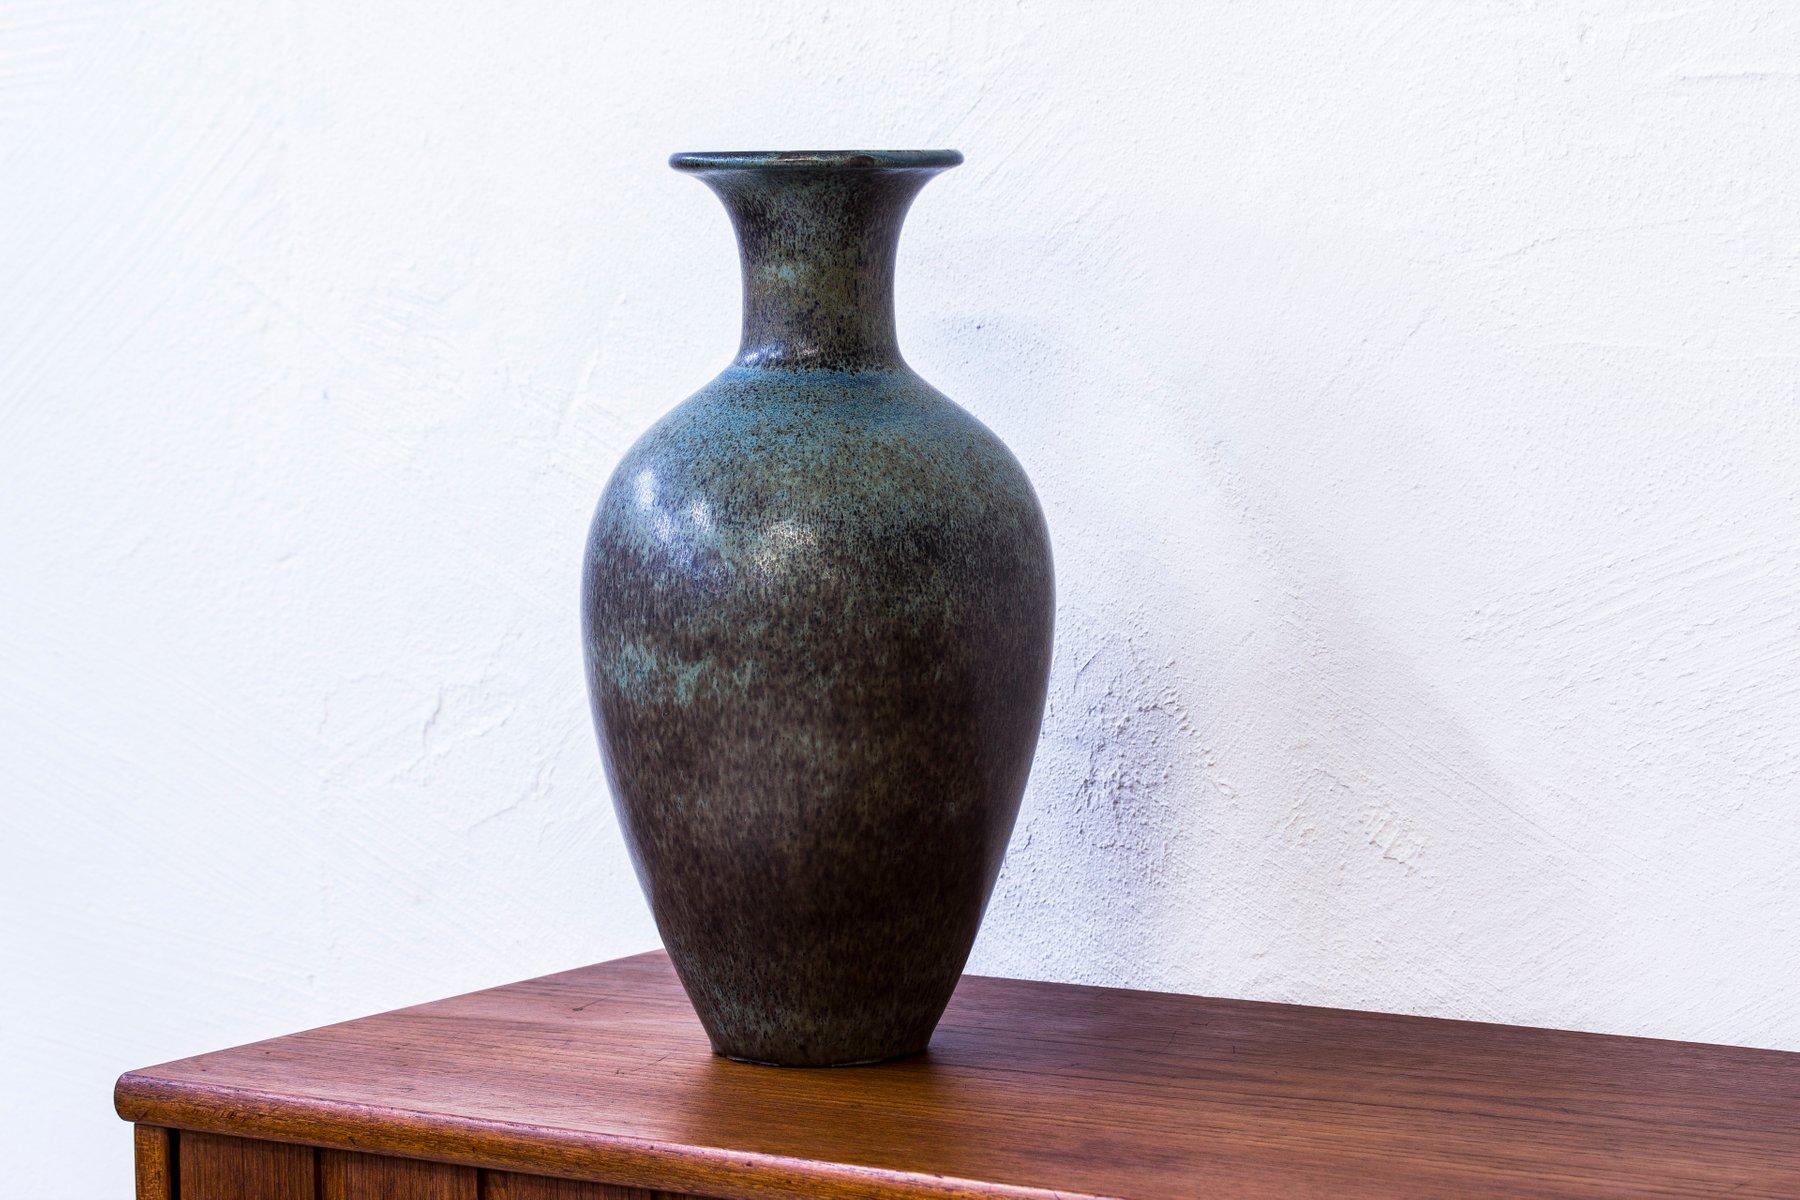 vase de sol en gr s par gunnar nylund pour r stand 1950s en vente sur pamono. Black Bedroom Furniture Sets. Home Design Ideas